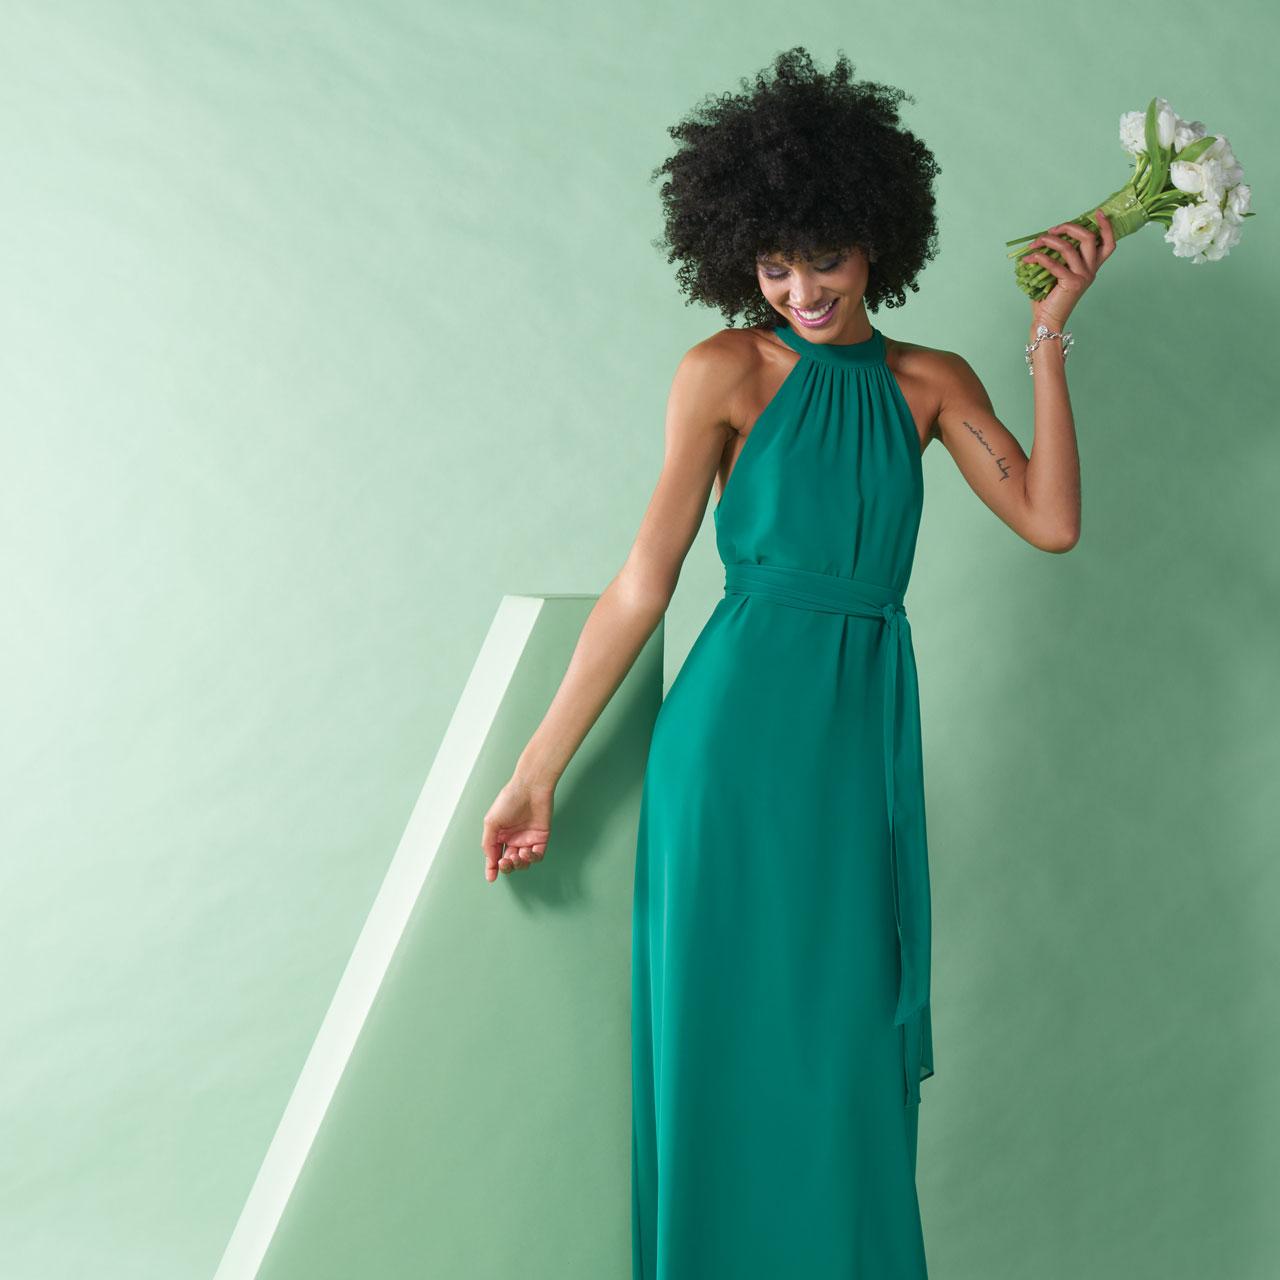 Bright, Colorful Bridesmaid Dresses